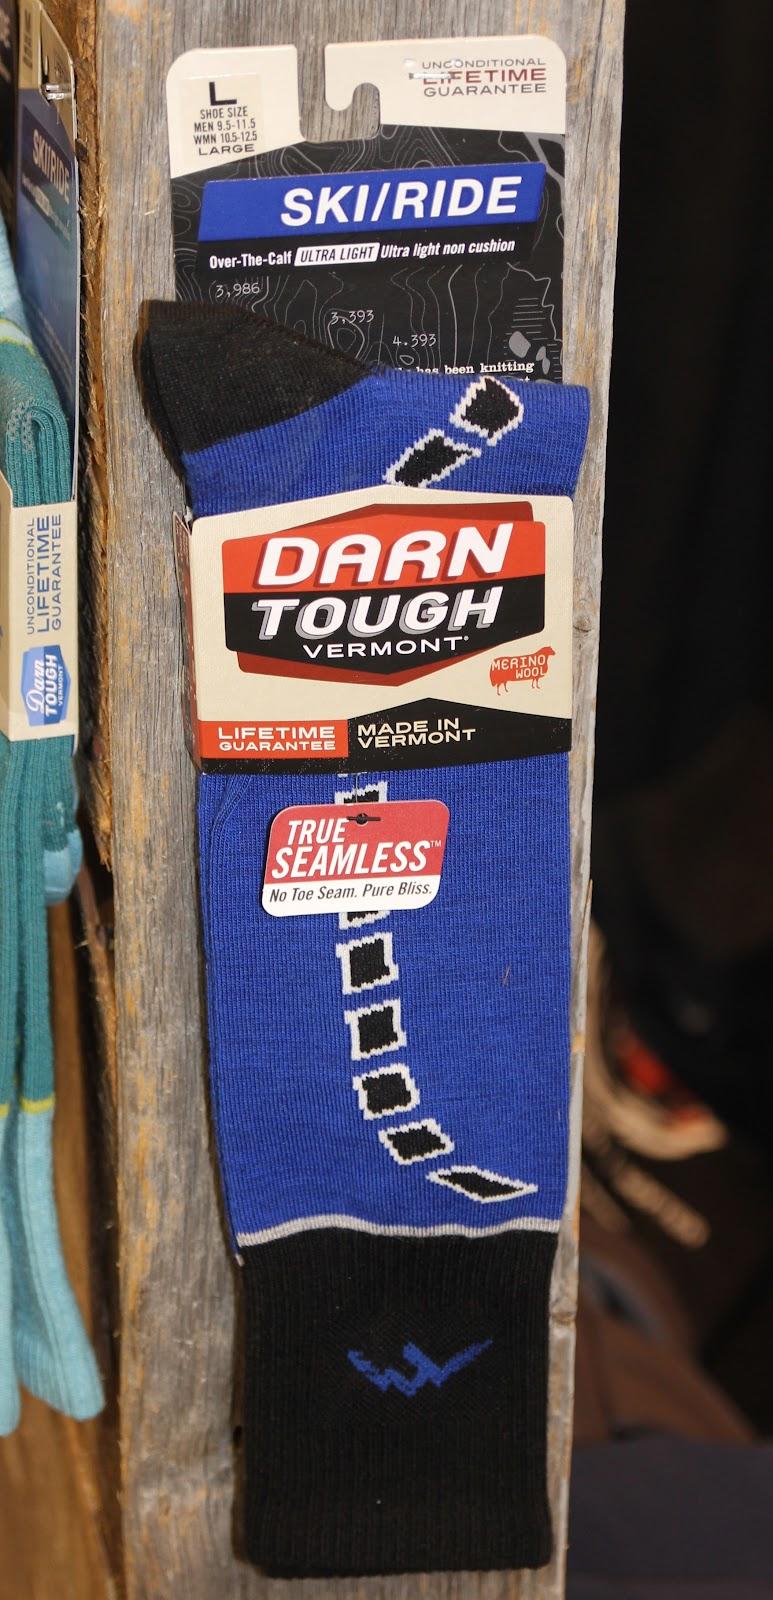 df723541f Also new-are the fine gauge merino wool   nylon Lycra® Spandex  Over-The-Calf Women s Men s Fang Ultra-Light Ski Ride socks...that deliver  for Fall 2012.